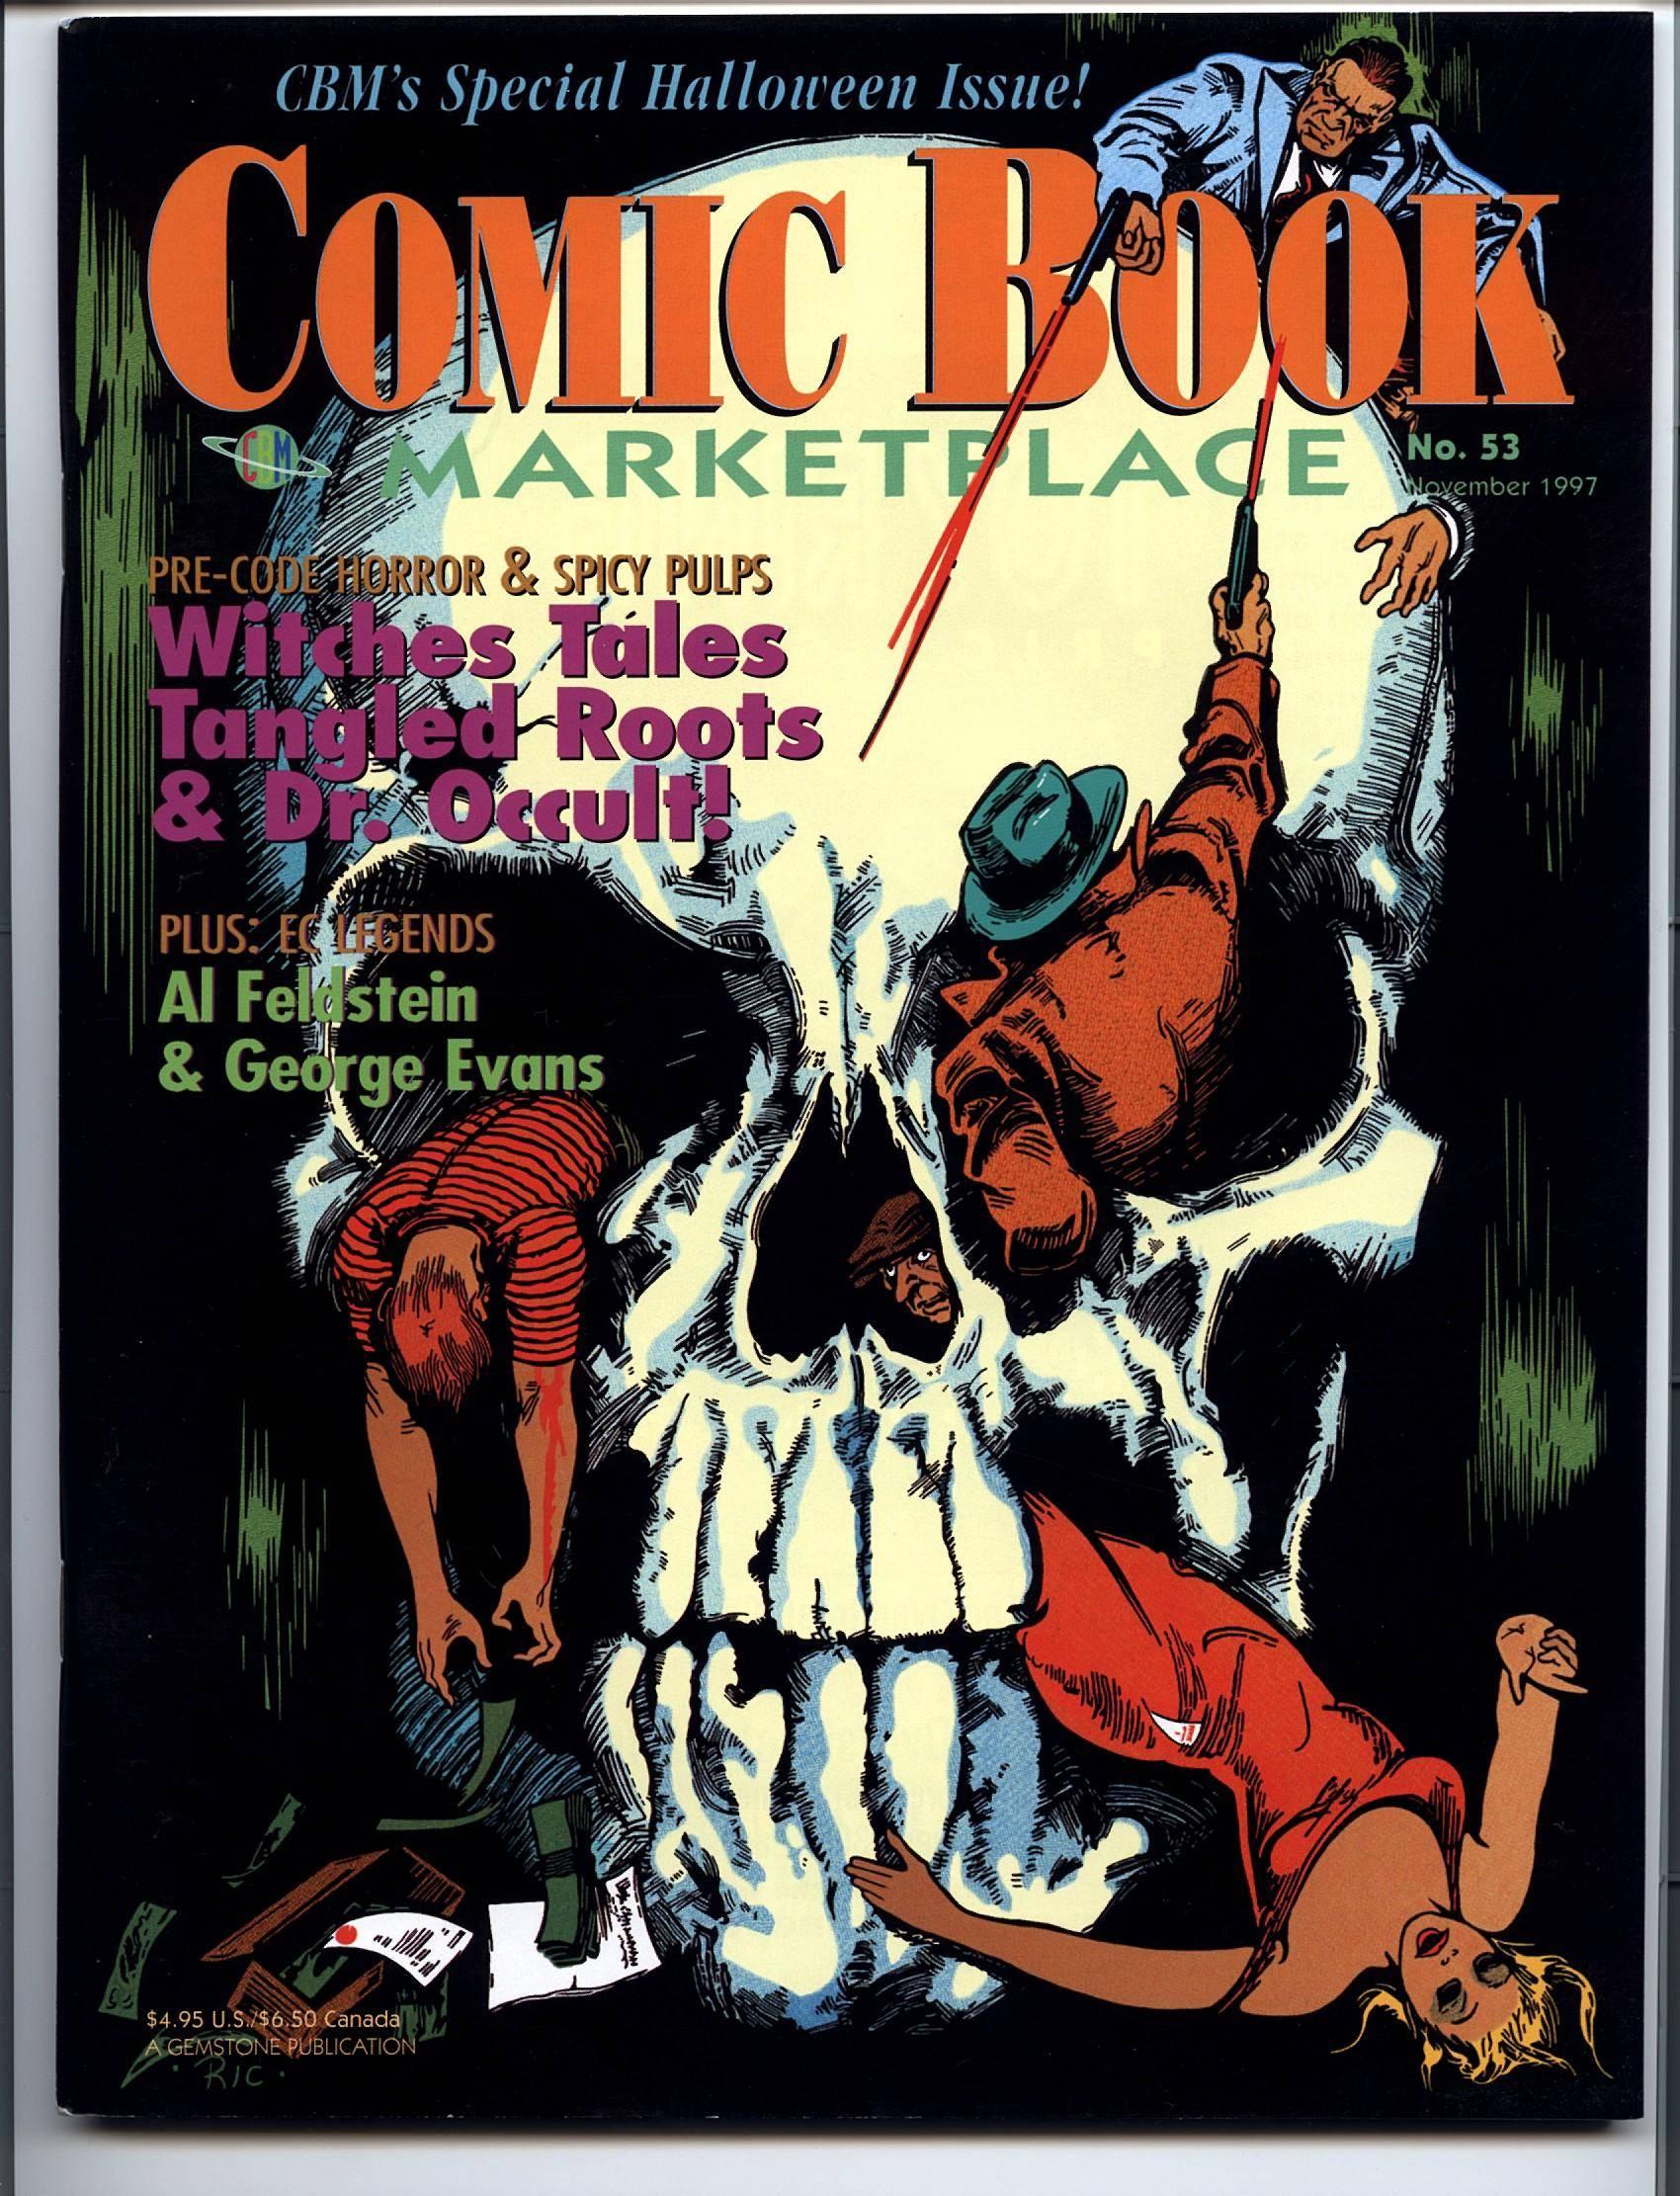 Comic Book Marketplace 053 1997